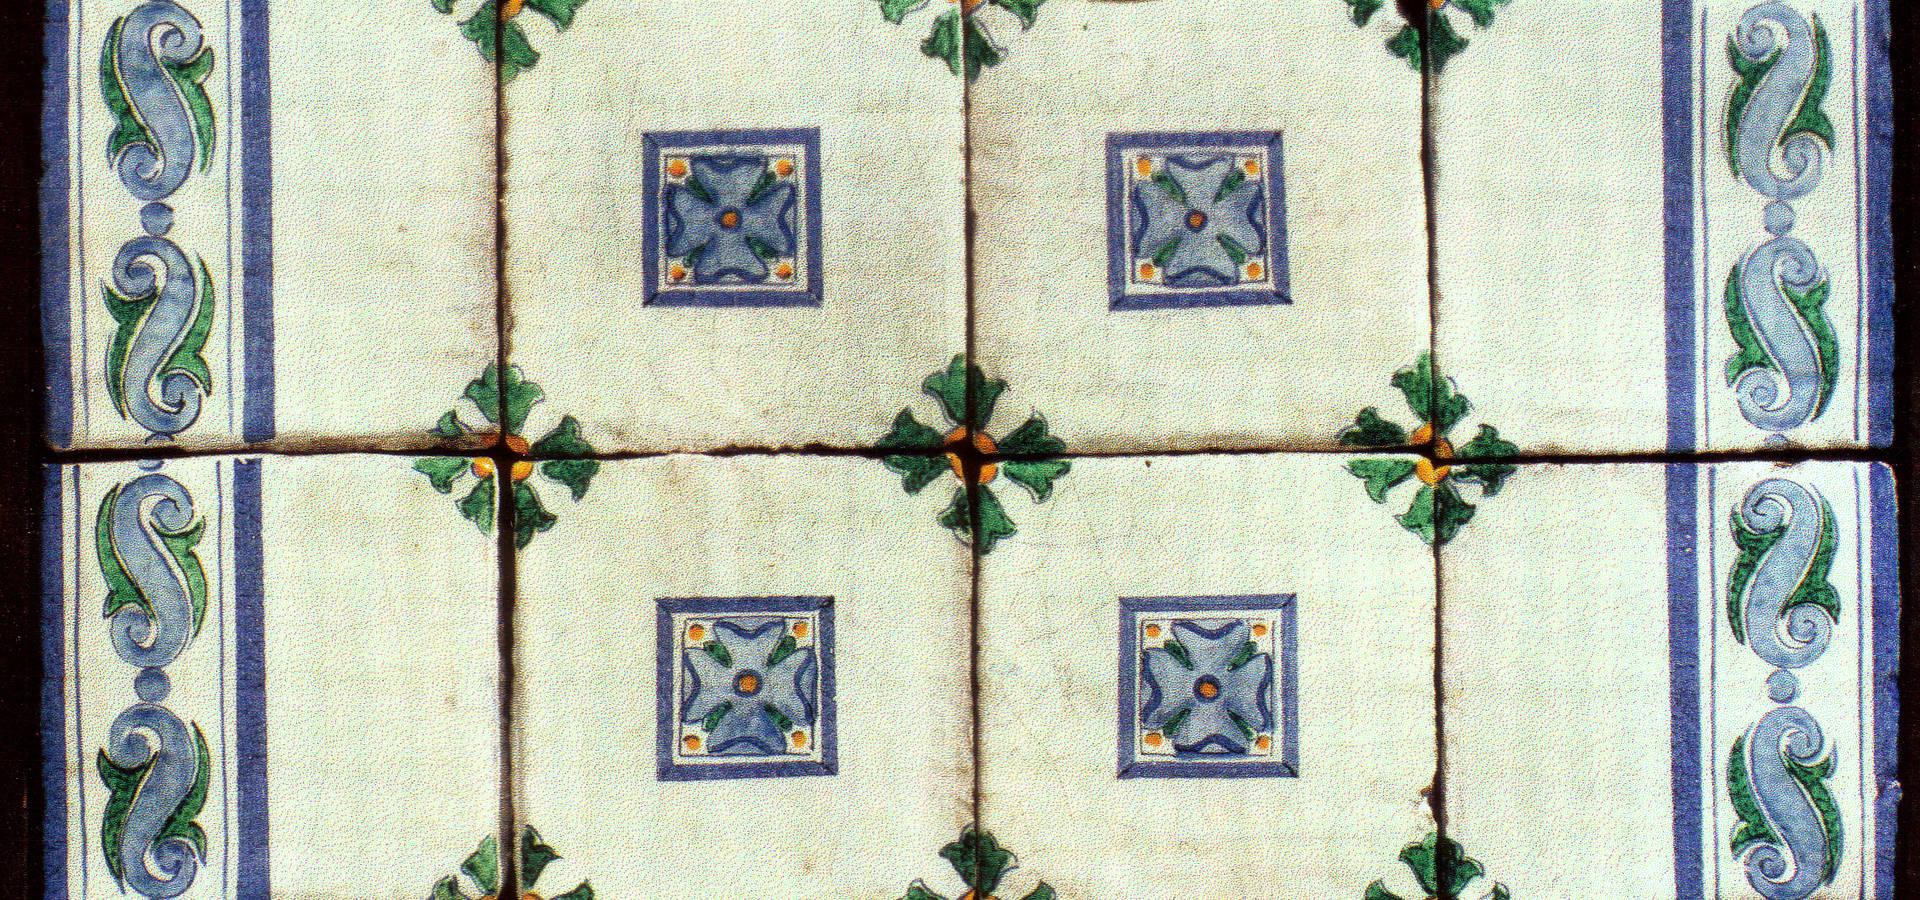 Consorzio Ceramiche DESUIR